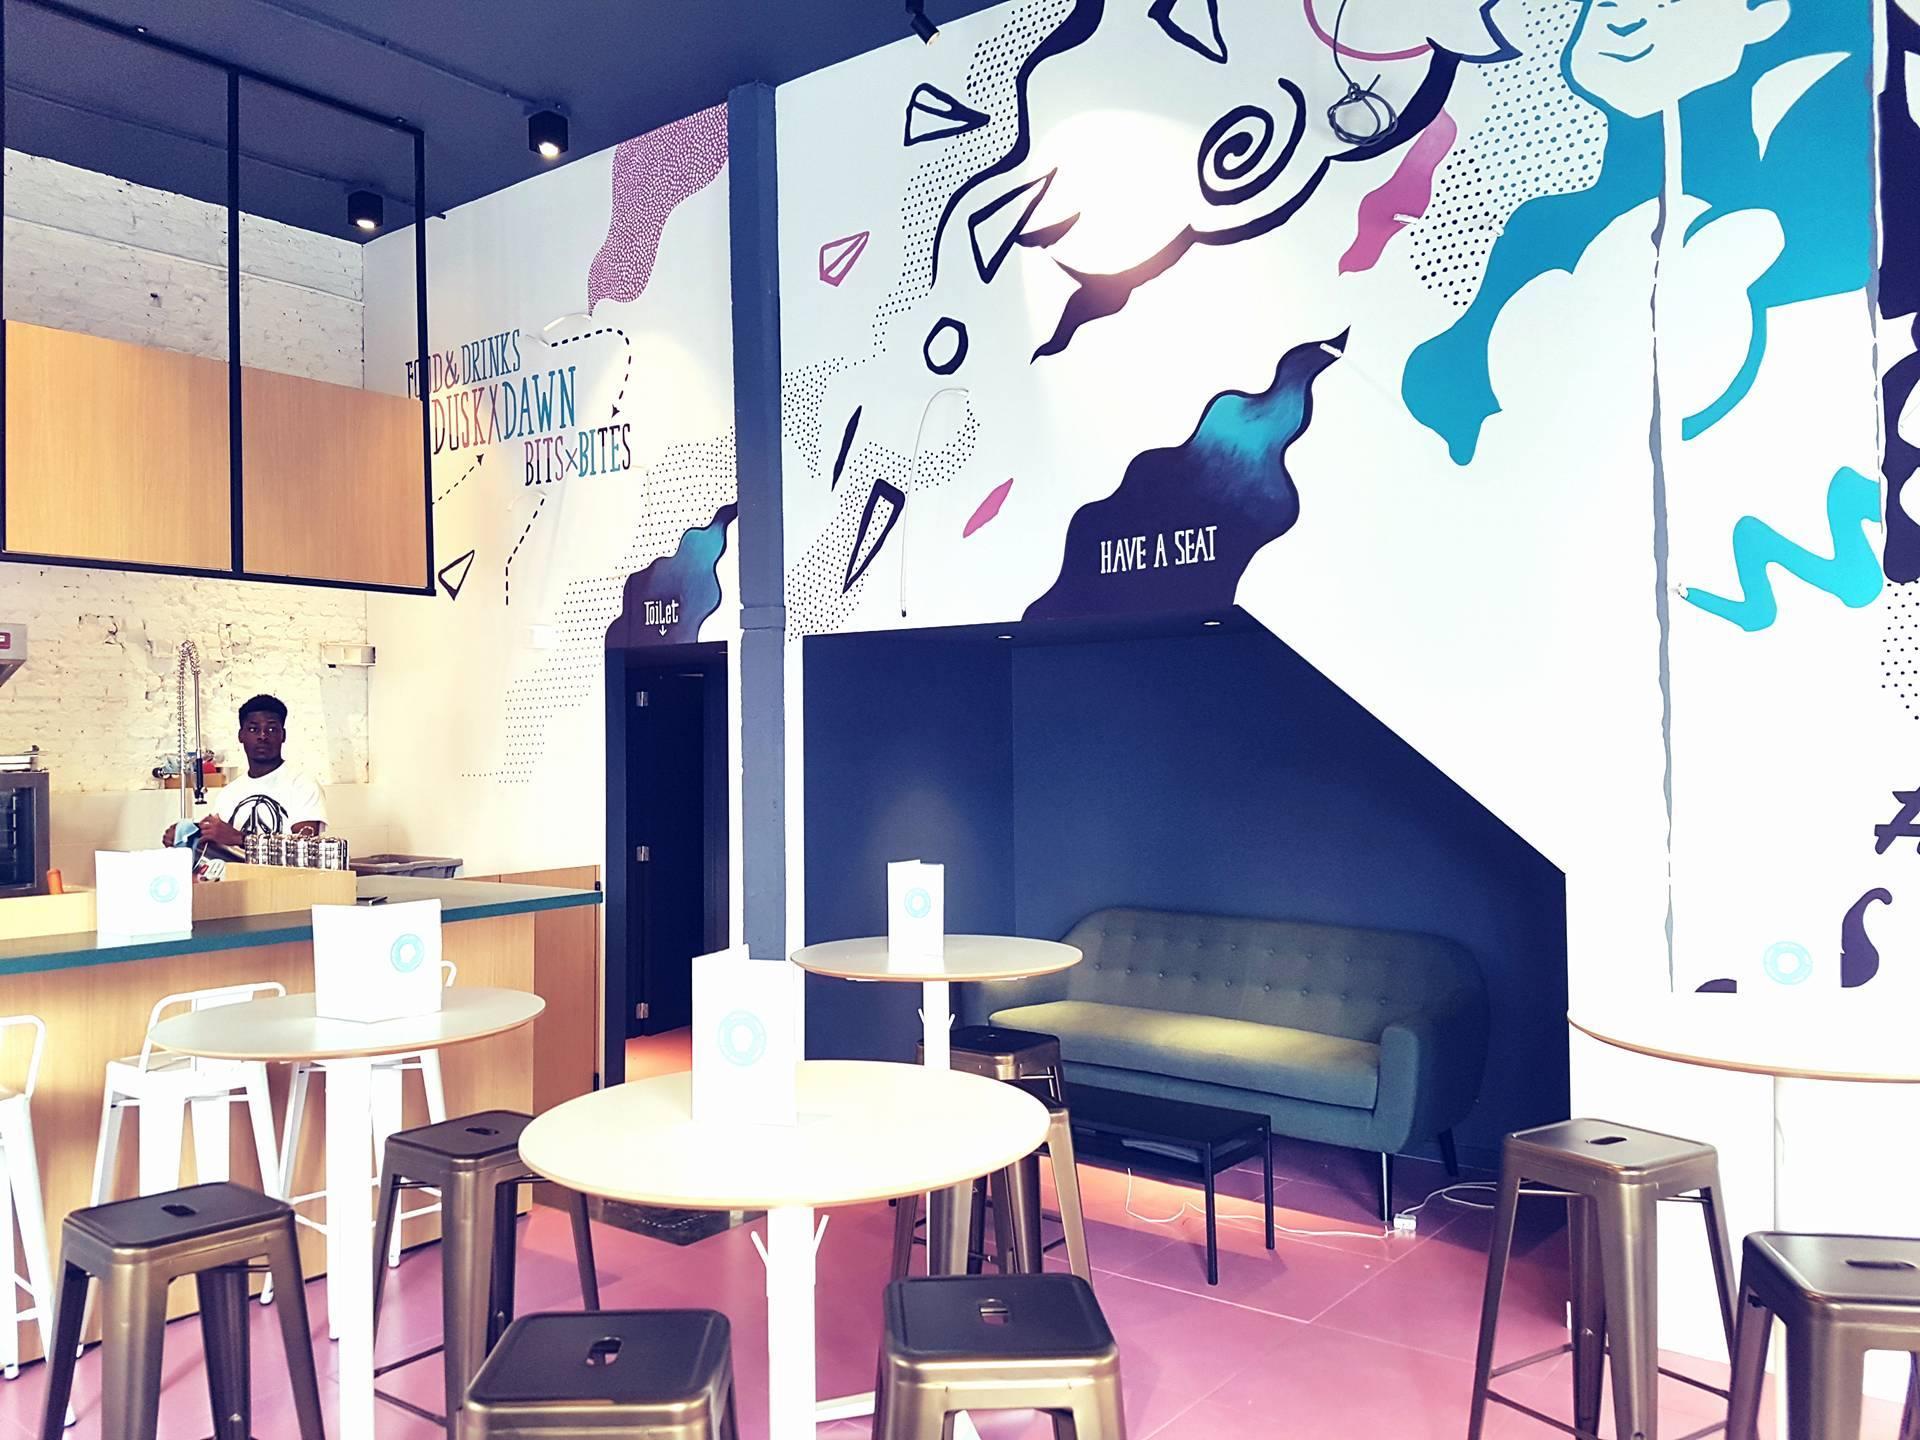 Interieur aziatisch restaurant Doi Doi in Antwerpen